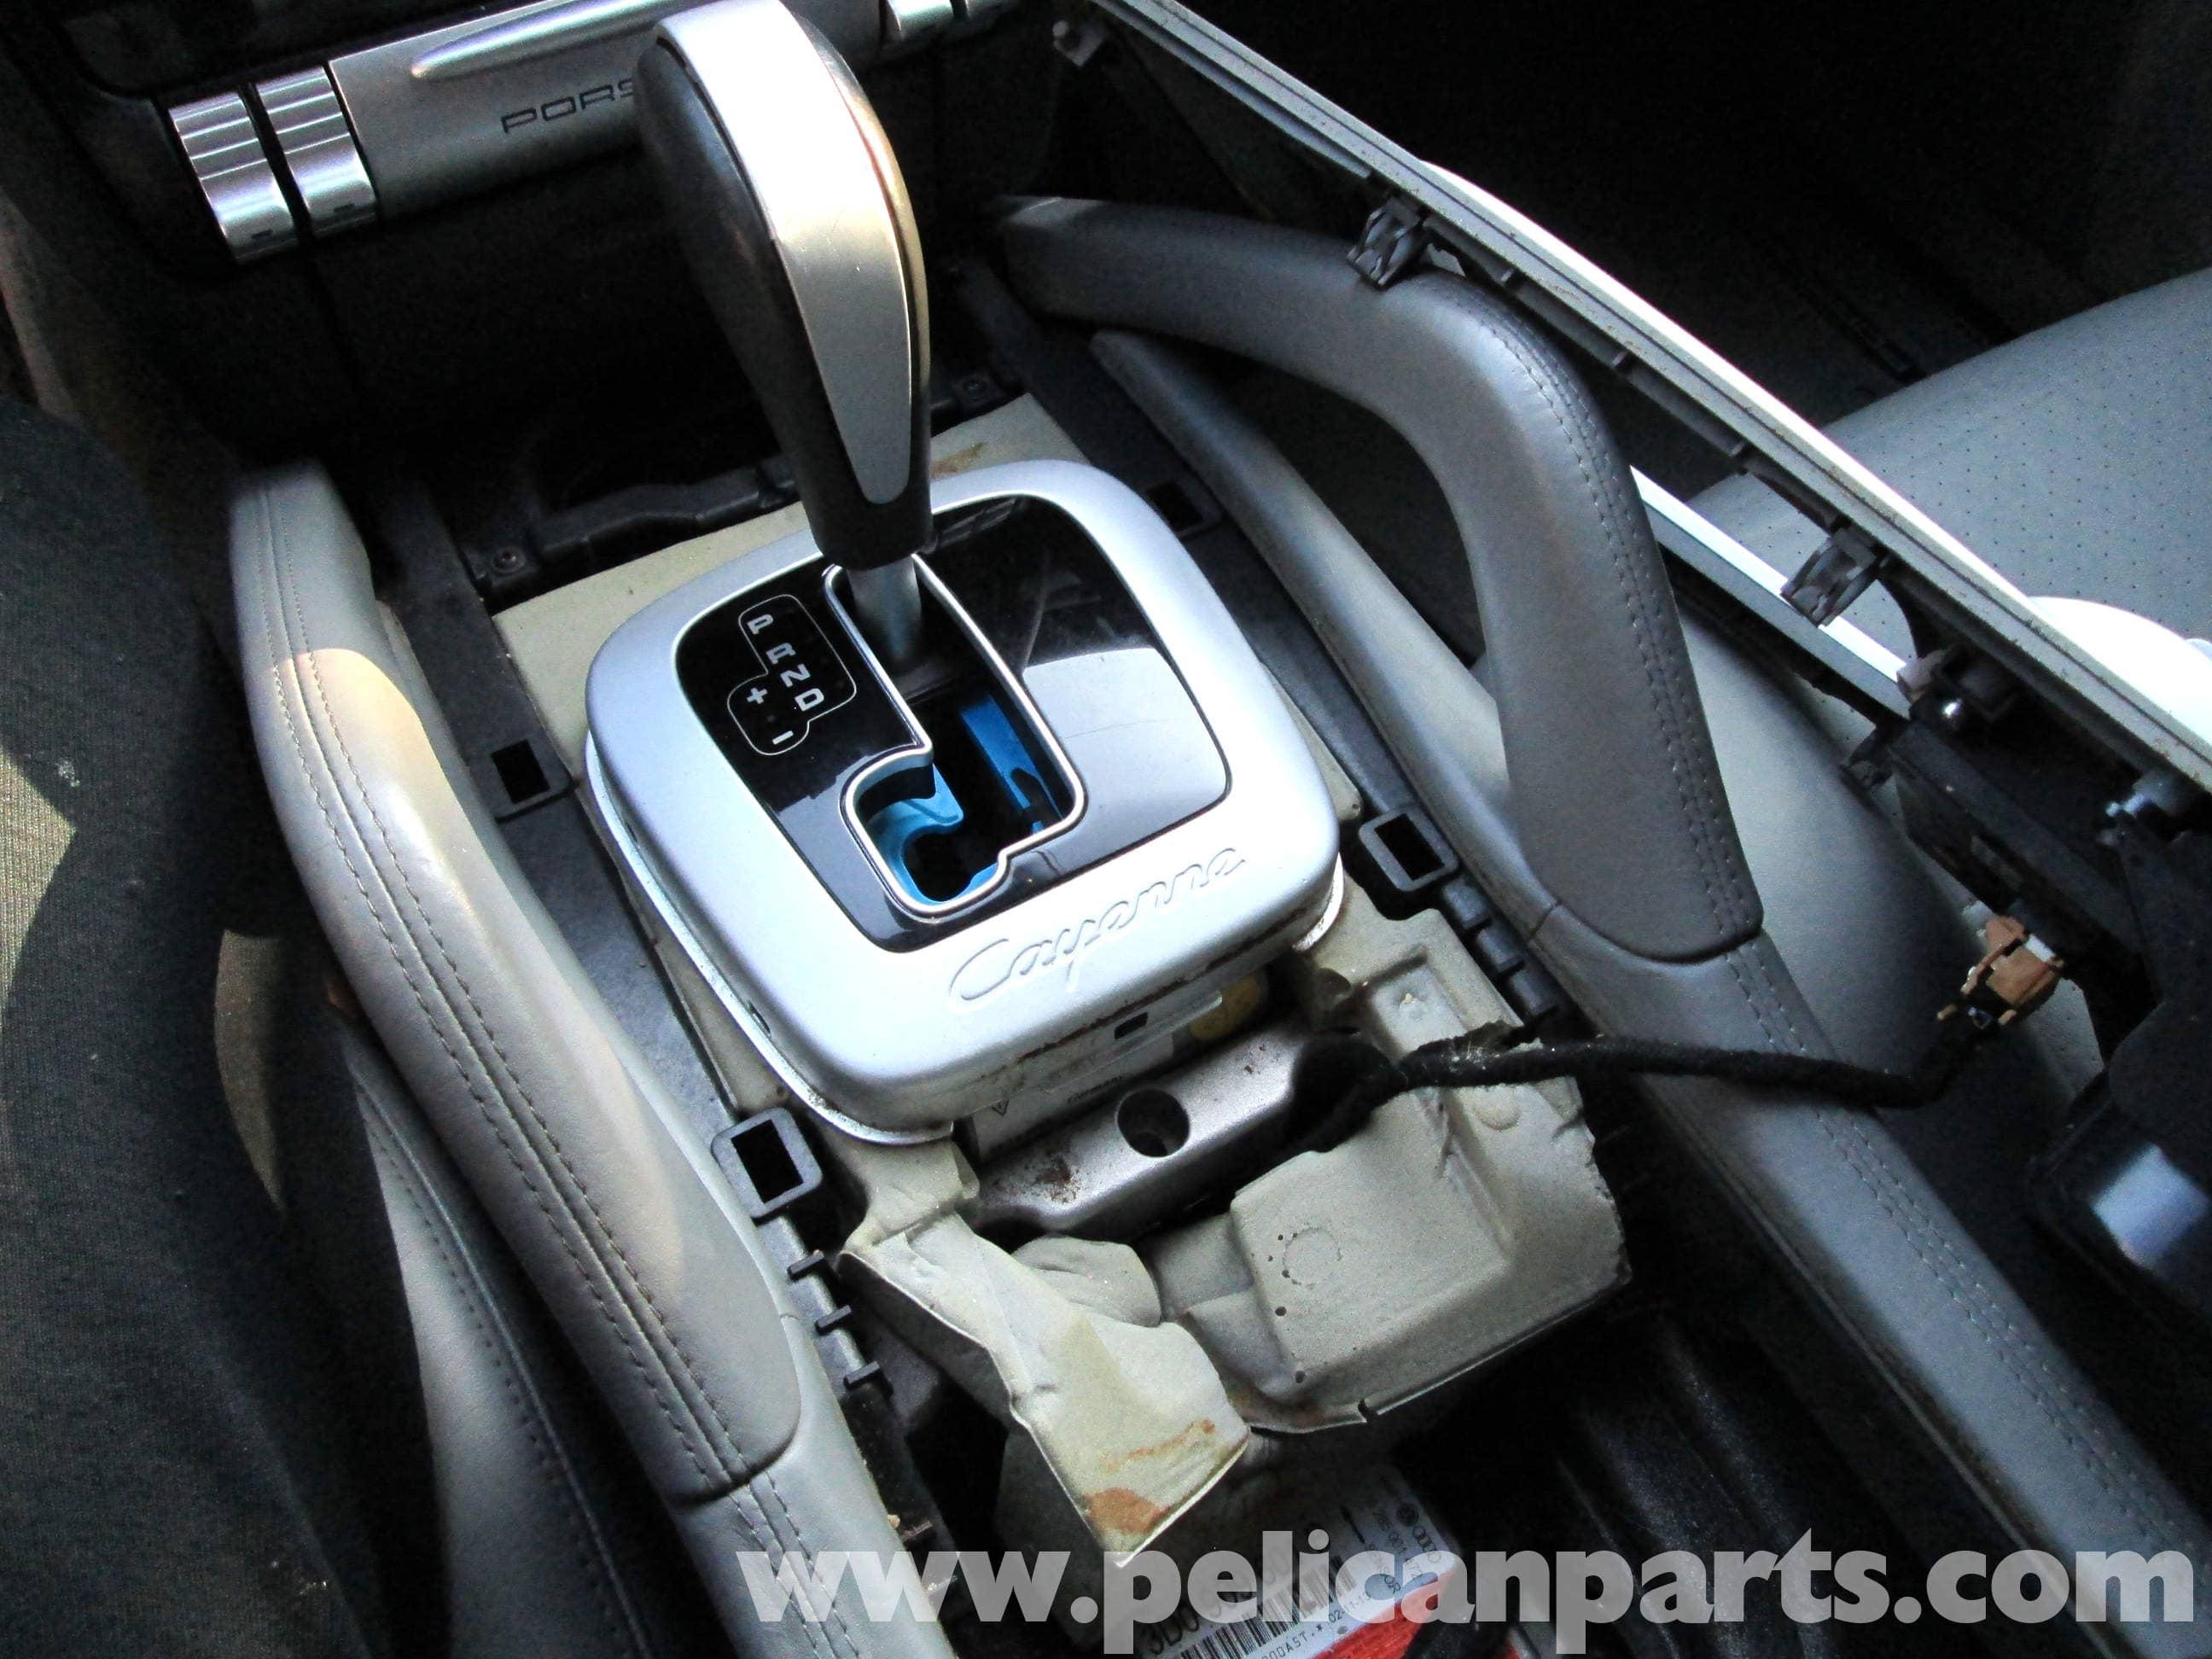 Porsche Cayenne Shift Gate Trim Replacement 2003 2008